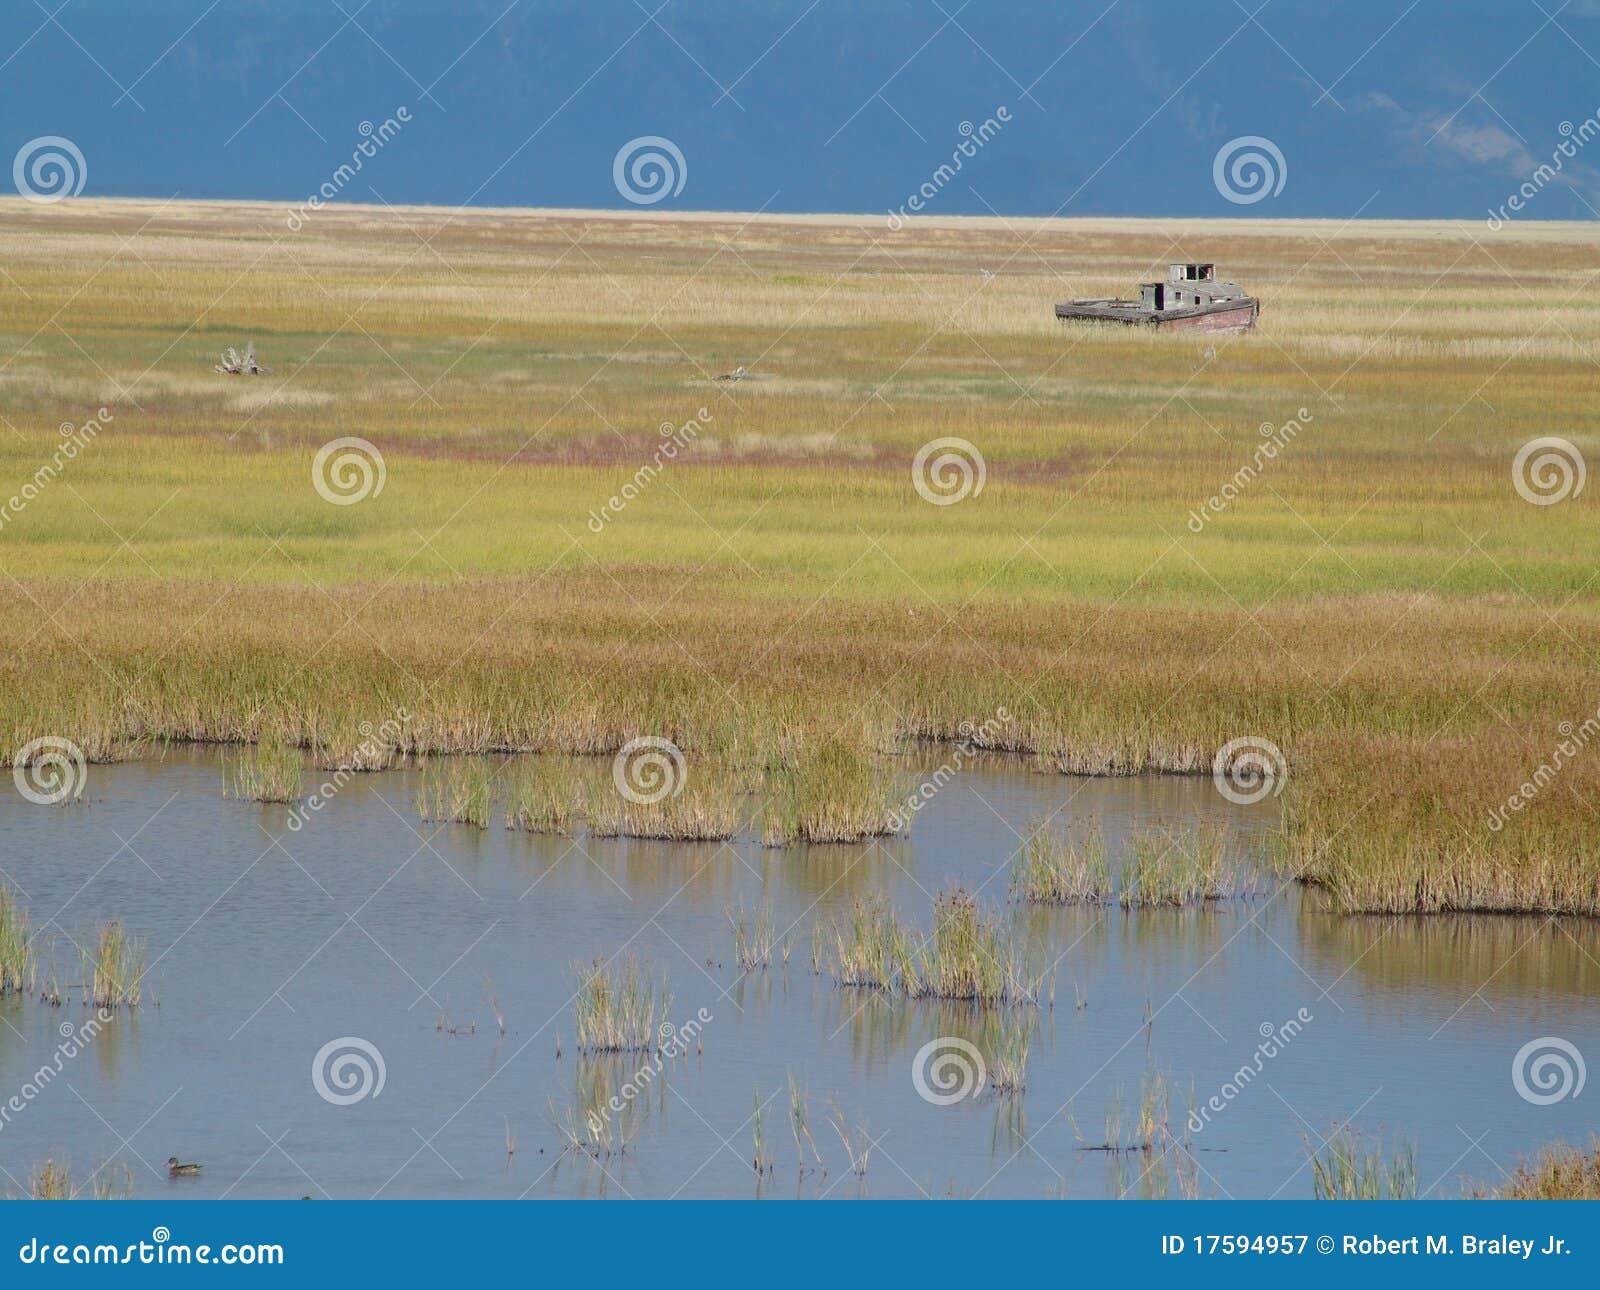 Boat on marsh or wetland